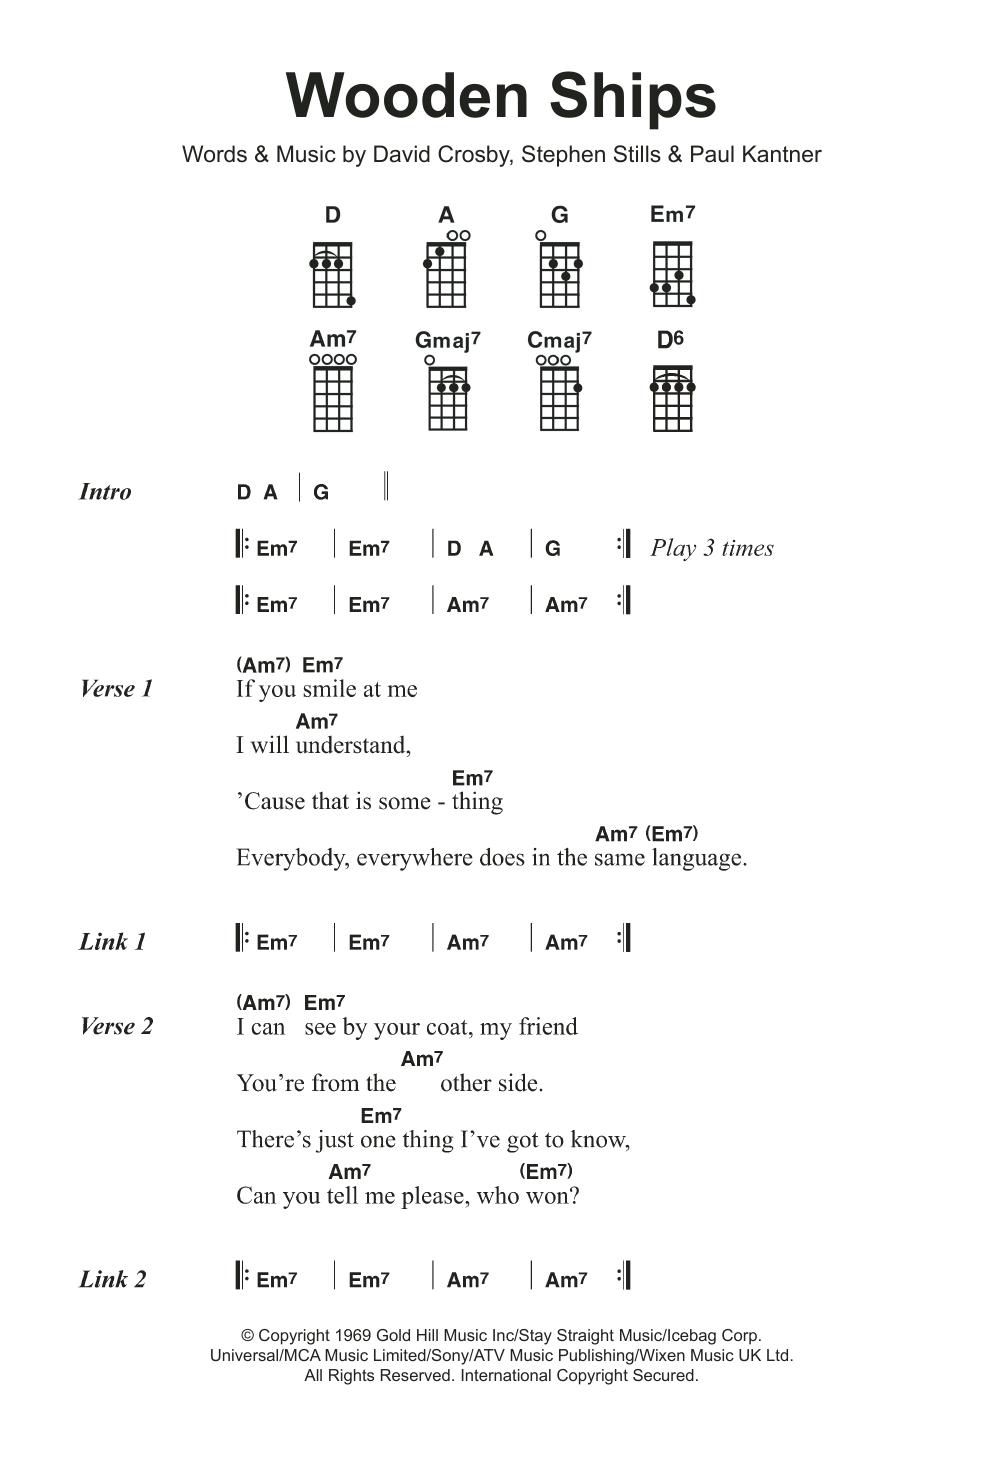 Sheet Music Digital Files To Print - Licensed David Crosby Digital